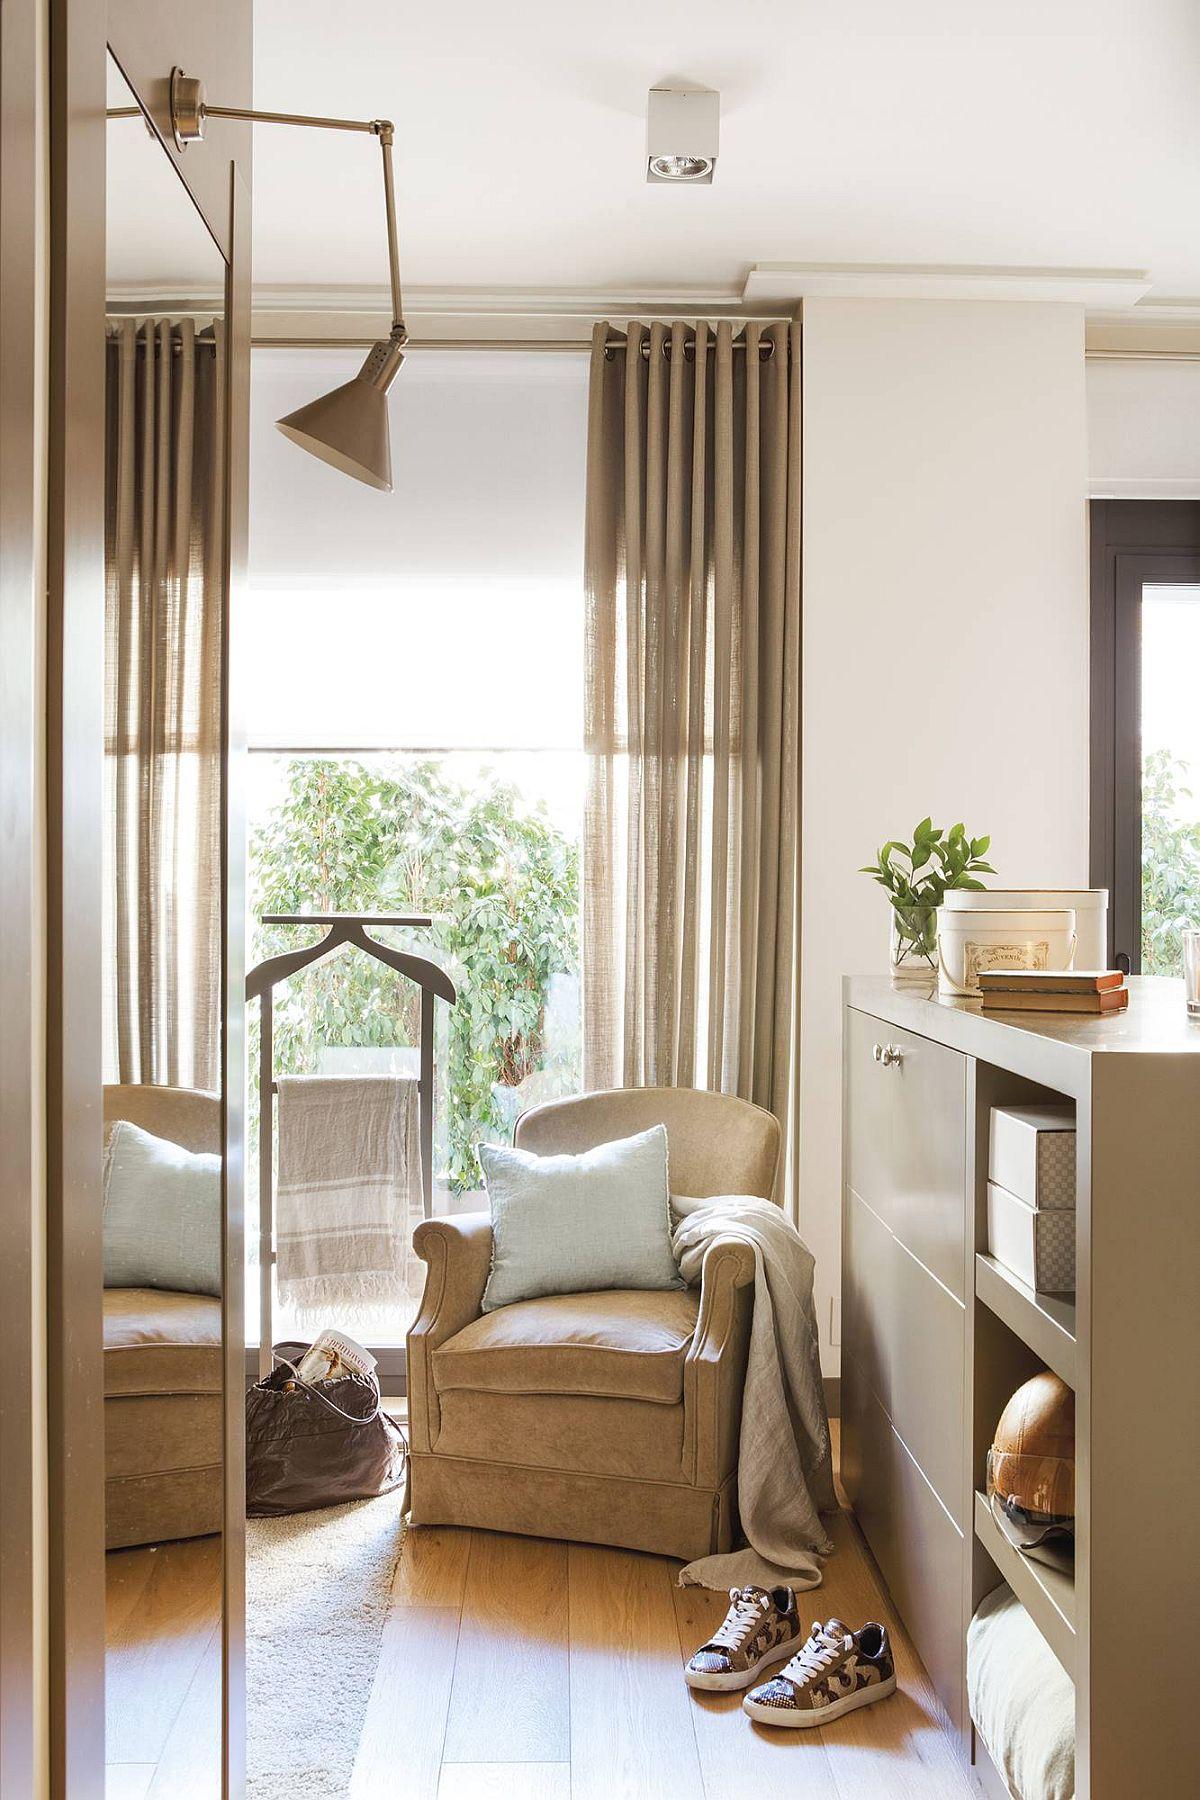 adelaparvu.com despre apartament amenajat in tonuri de bej, design Chari Manzano si Marta Herrera, Foto Pepa Oromi (3)